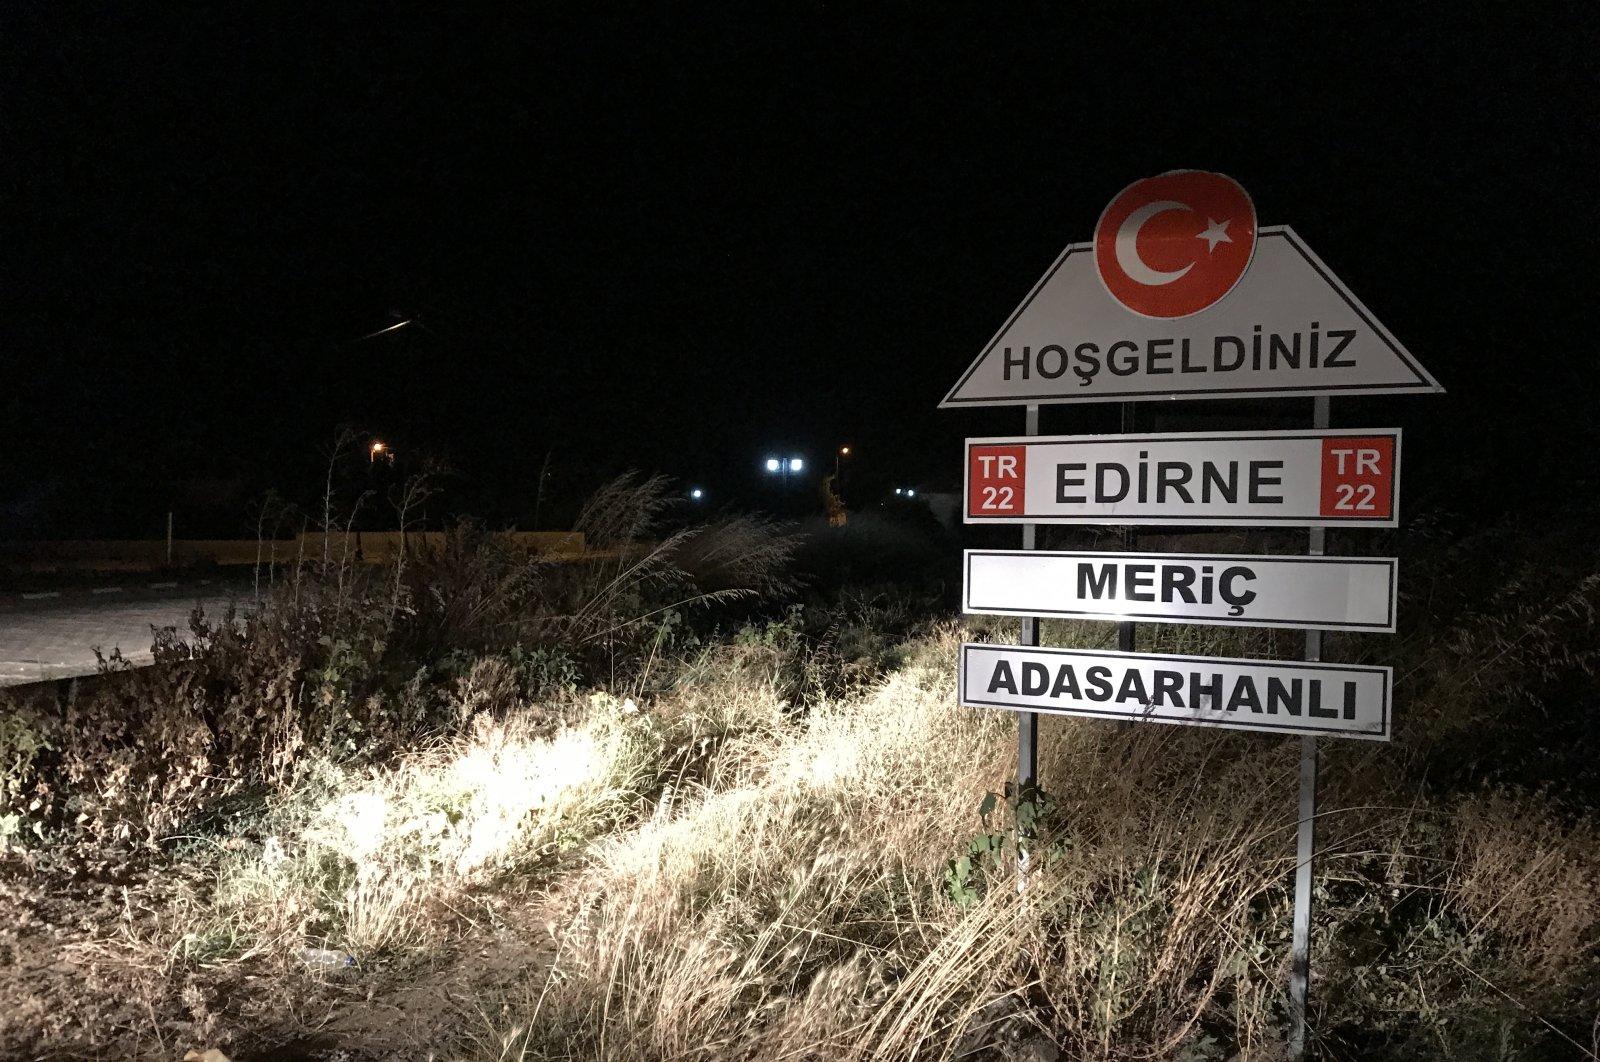 The welcome sign of Adasarhanlı village in Edirne, Turkey, is seen in this photo taken on Aug. 1, 2021. (AA Photo)